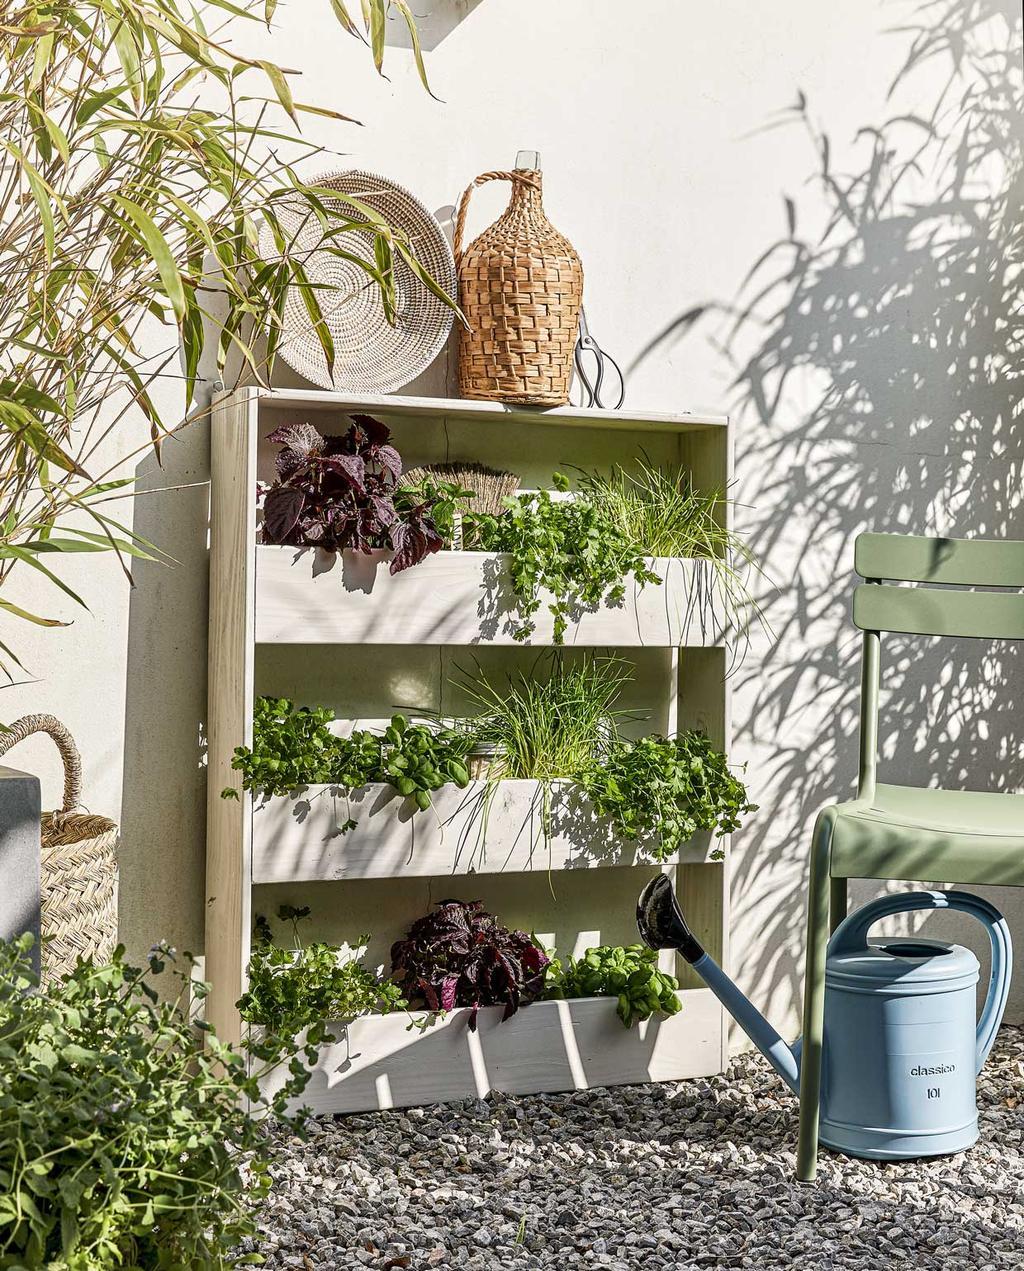 vtwonen special tuin 04 05-2021 | DIY plantenrek van wit hout met kruik bovenop, blauwe gieter en bamboe